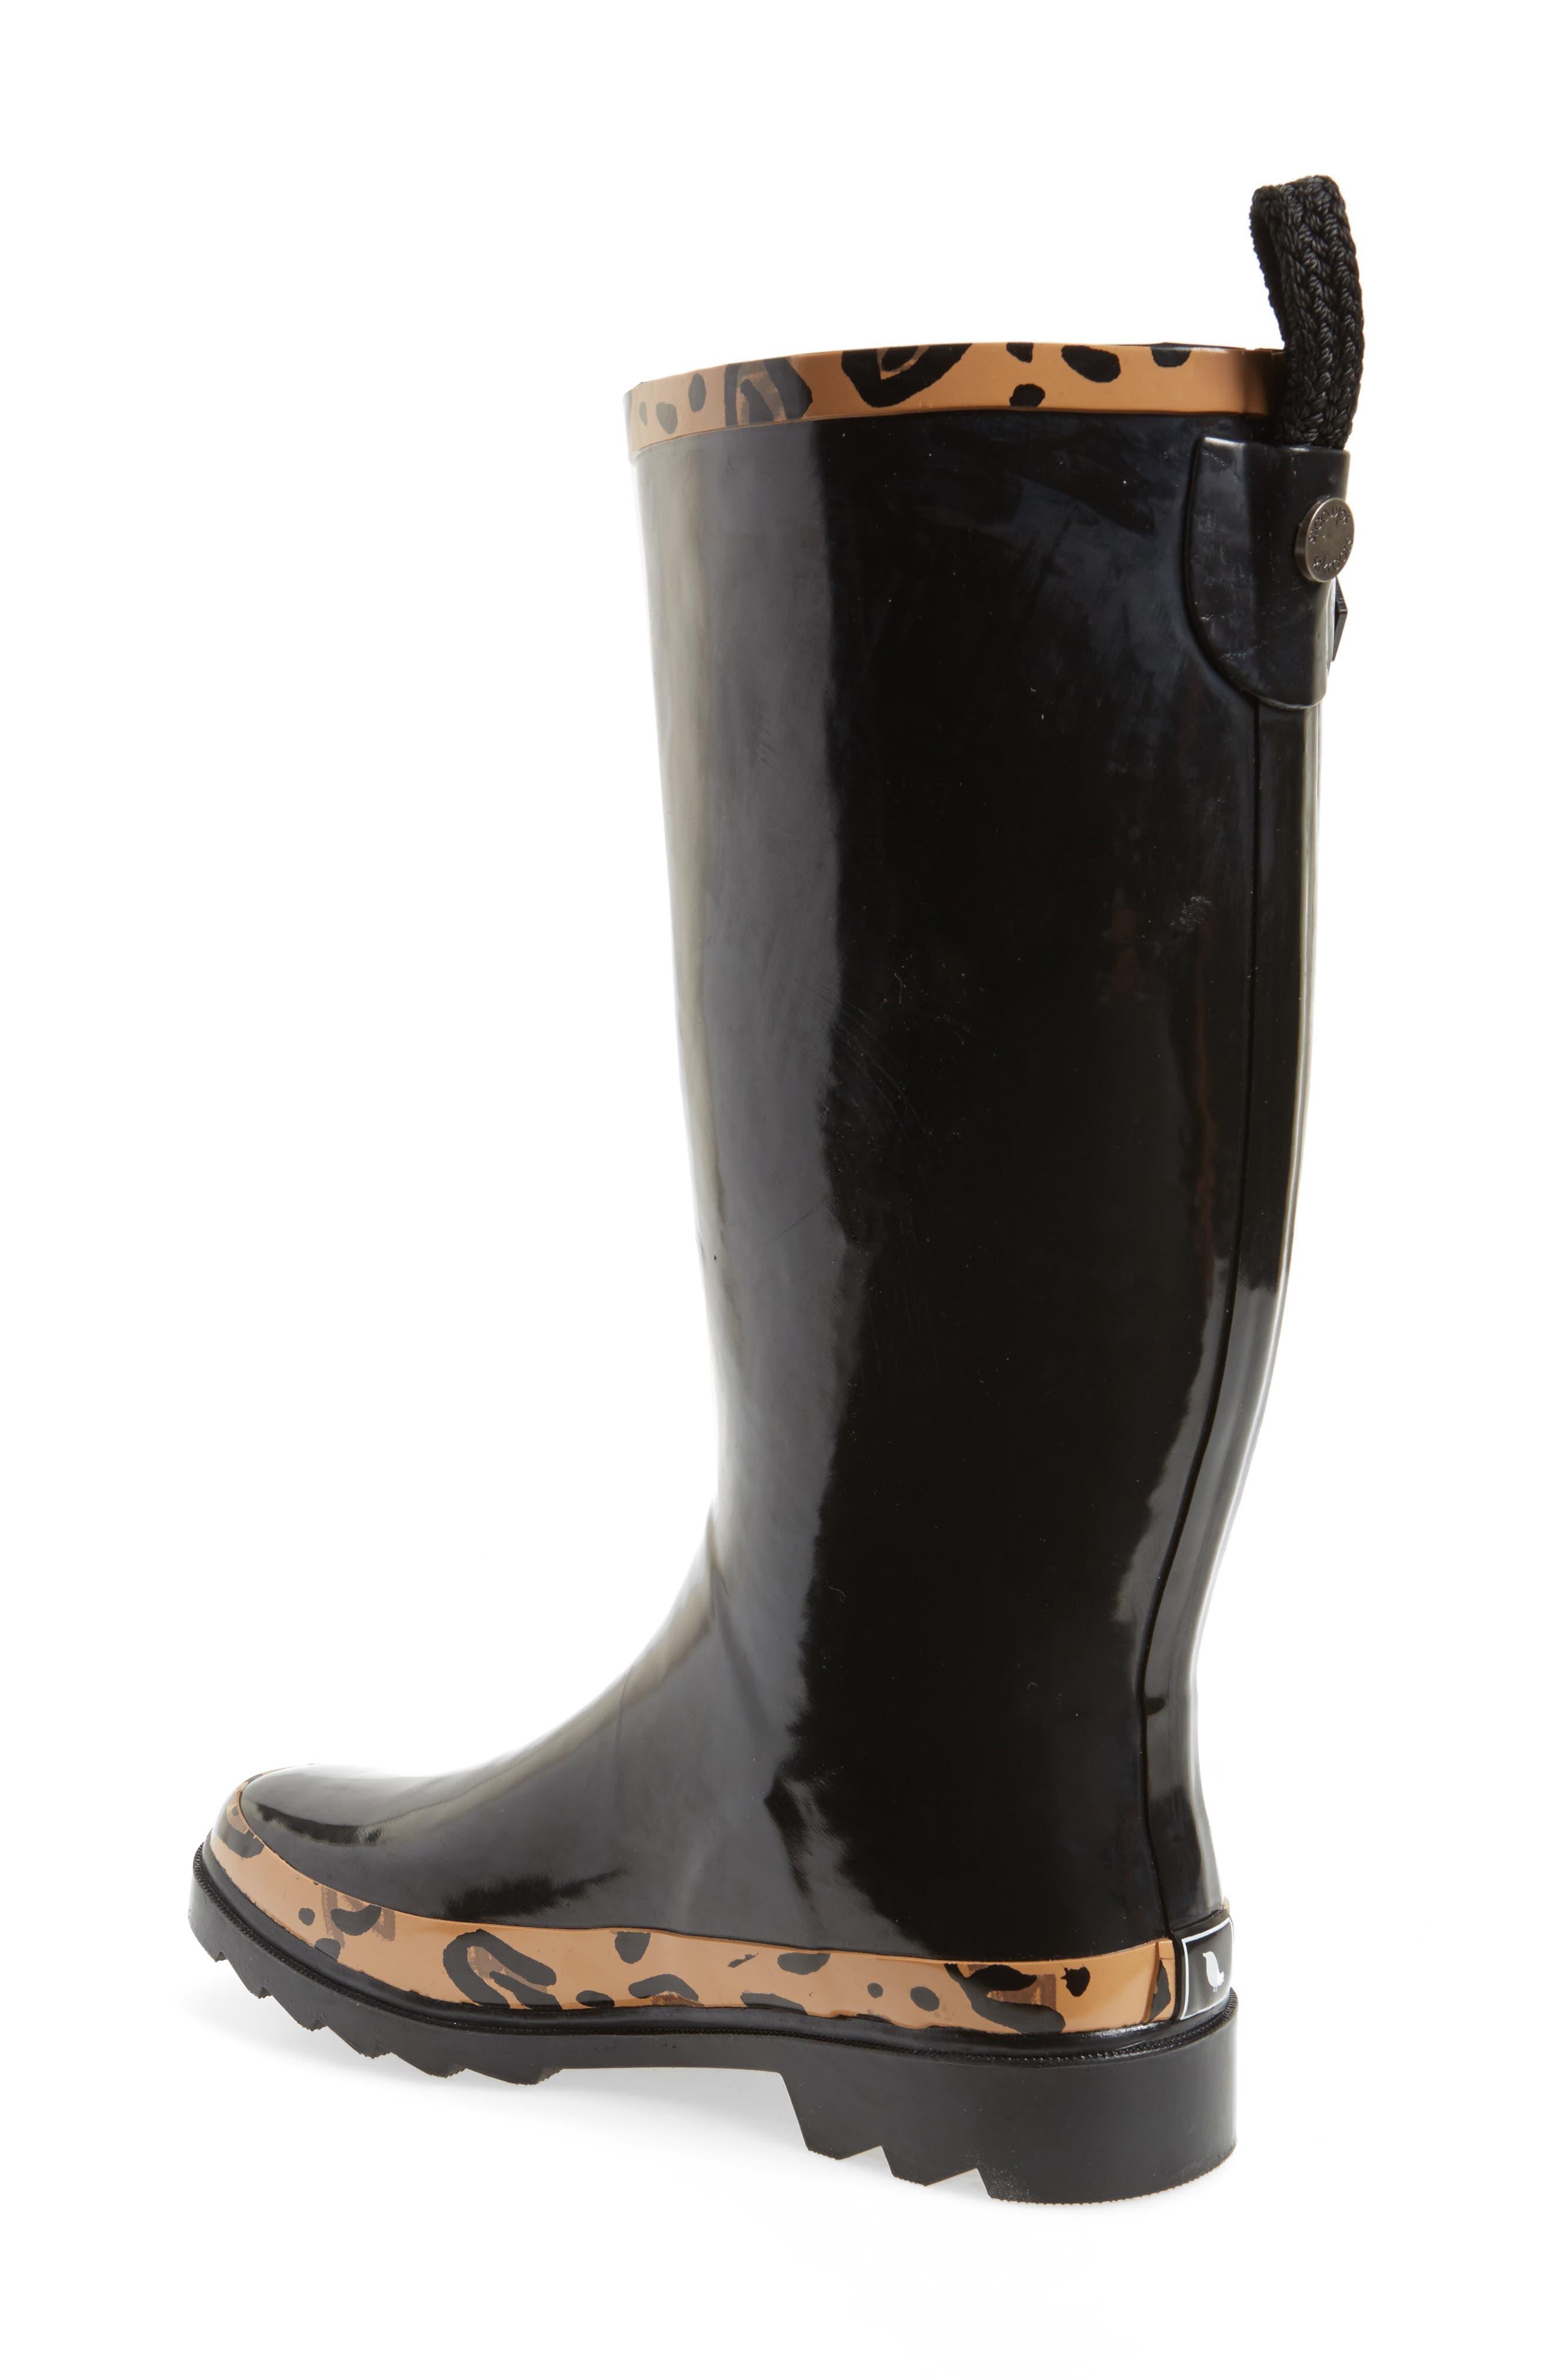 SAKROOTS, Rhythm Waterproof Rain Boot, Alternate thumbnail 2, color, BLACK LEOPARD PRINT